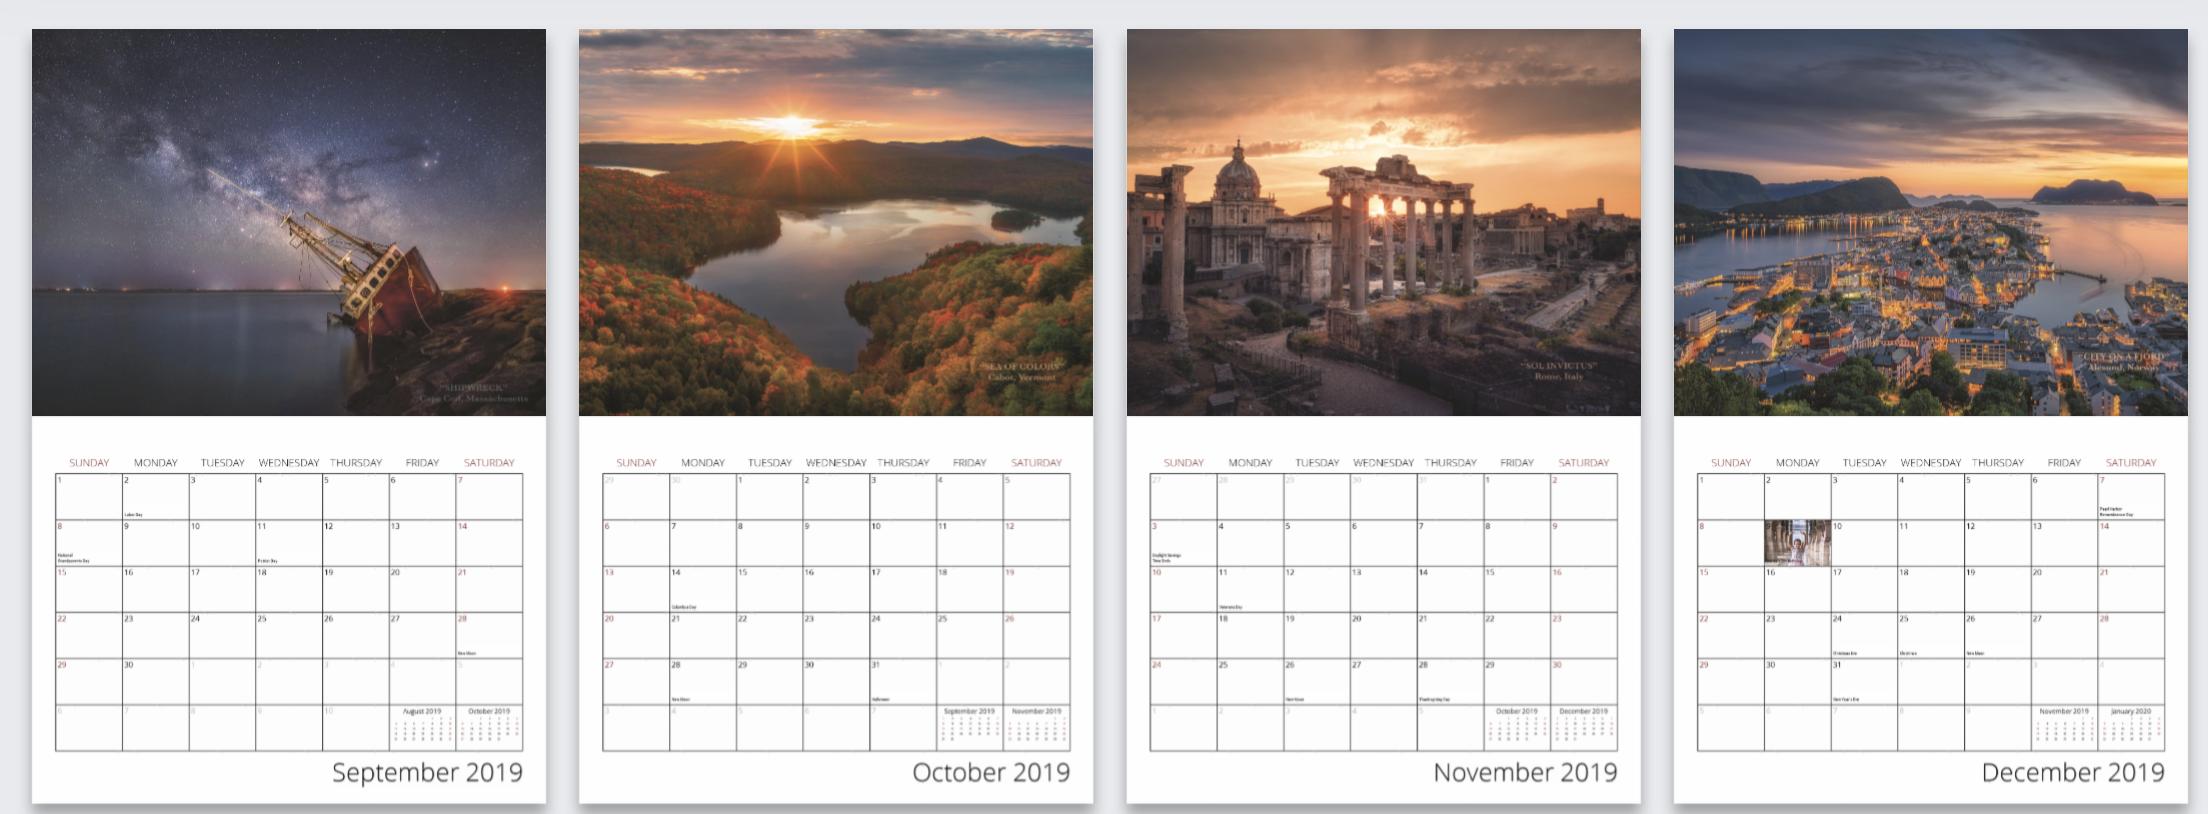 Screenshot 2018-10-22 10.02.10.png